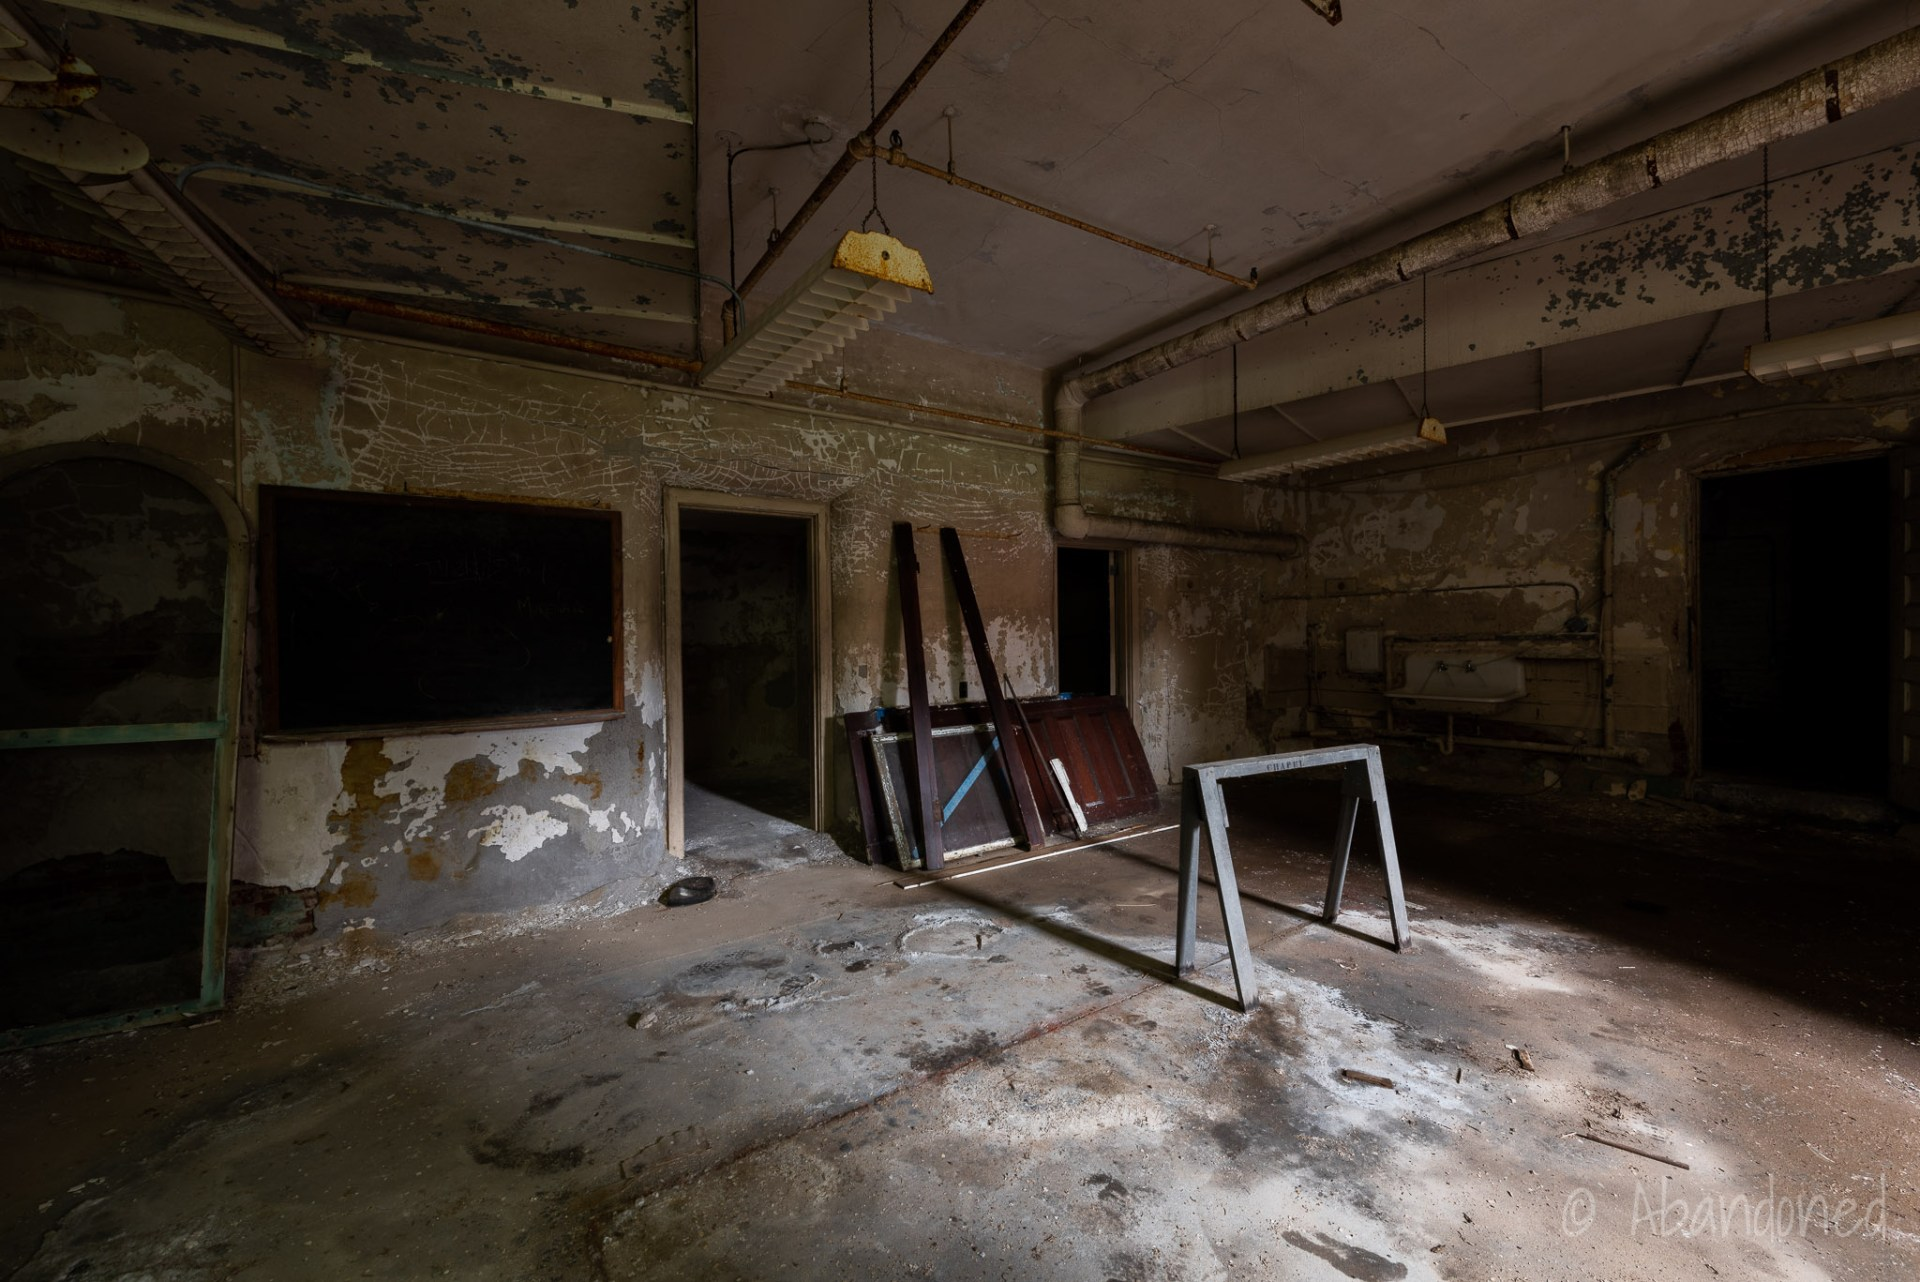 Medfield State Hospital Morgue